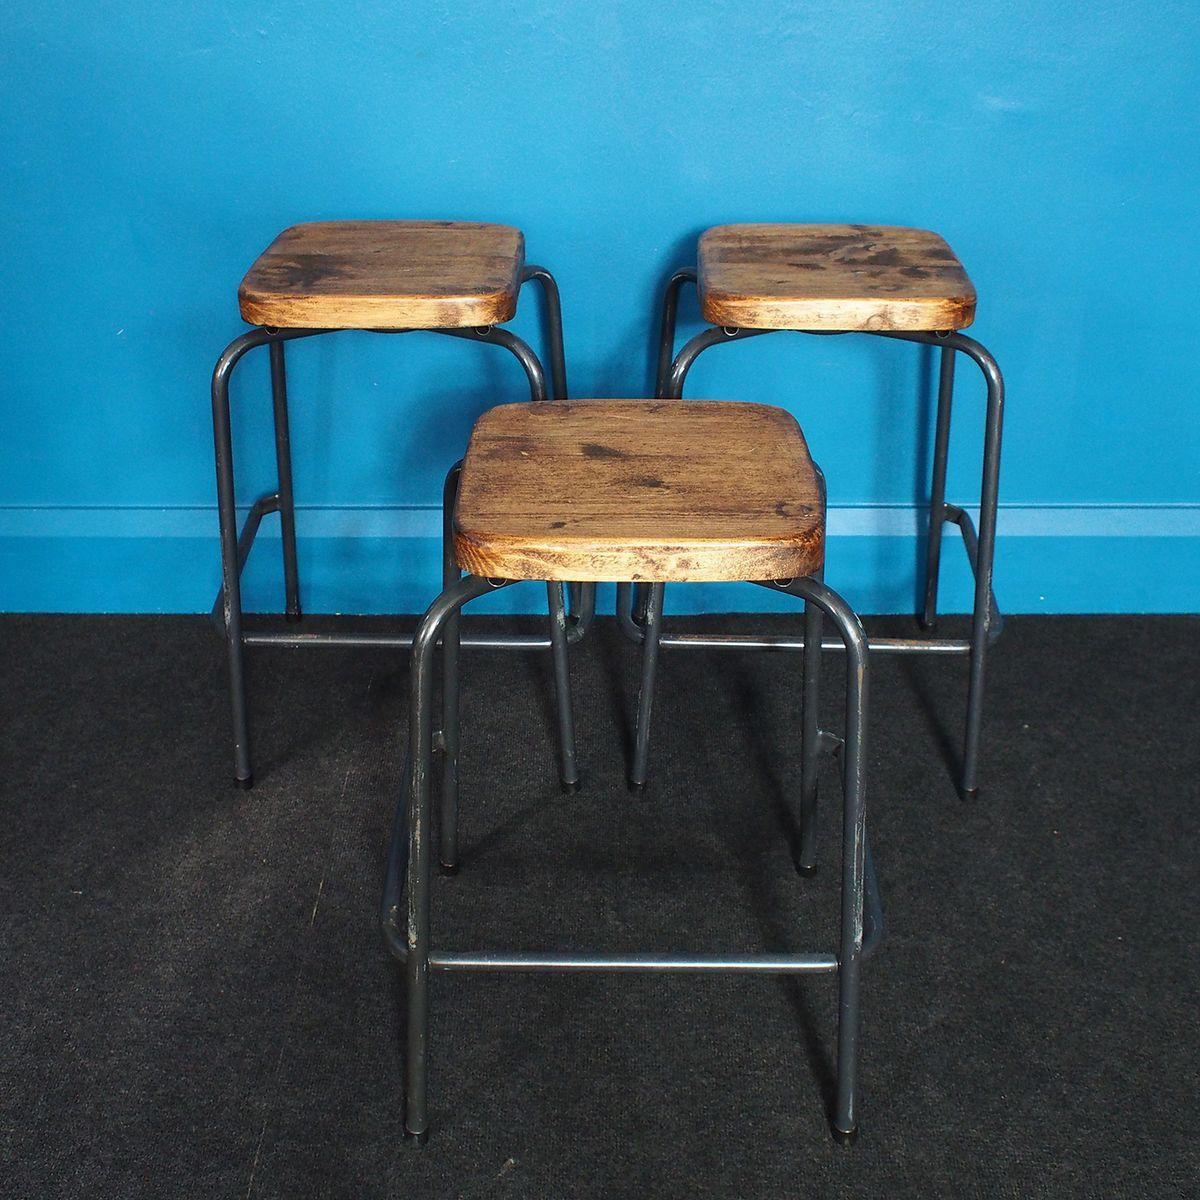 stapelbare ergonomische vintage industrie rohrstahl hocker. Black Bedroom Furniture Sets. Home Design Ideas